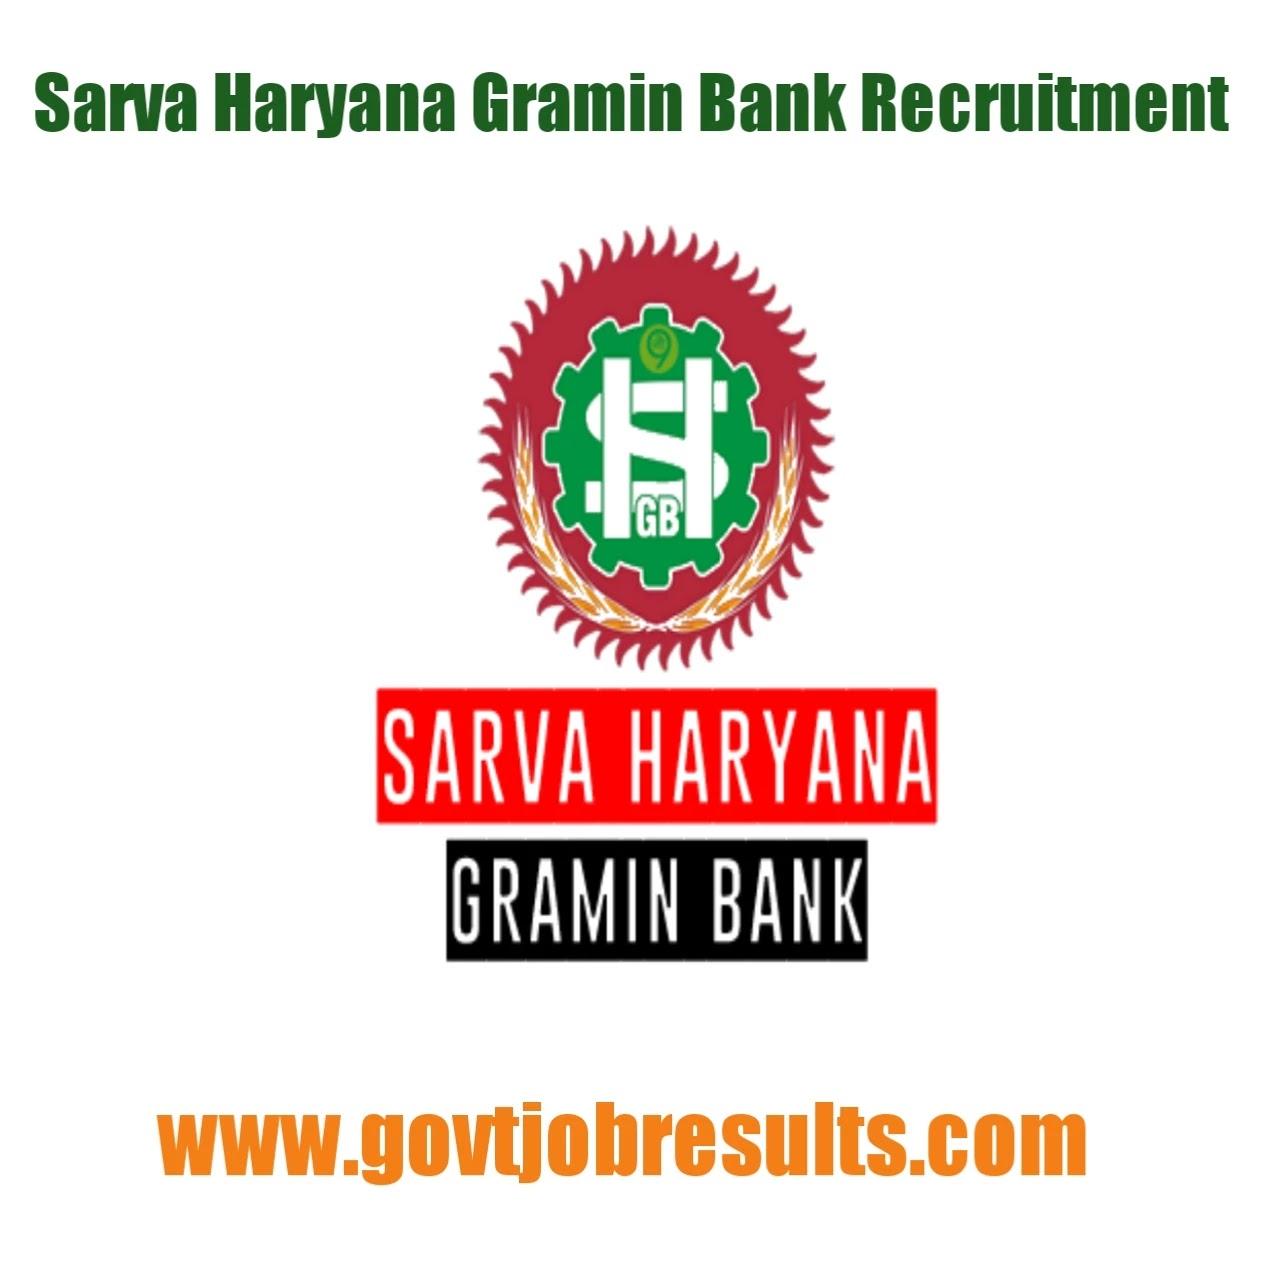 Sarva haryana gramin bank recruitment